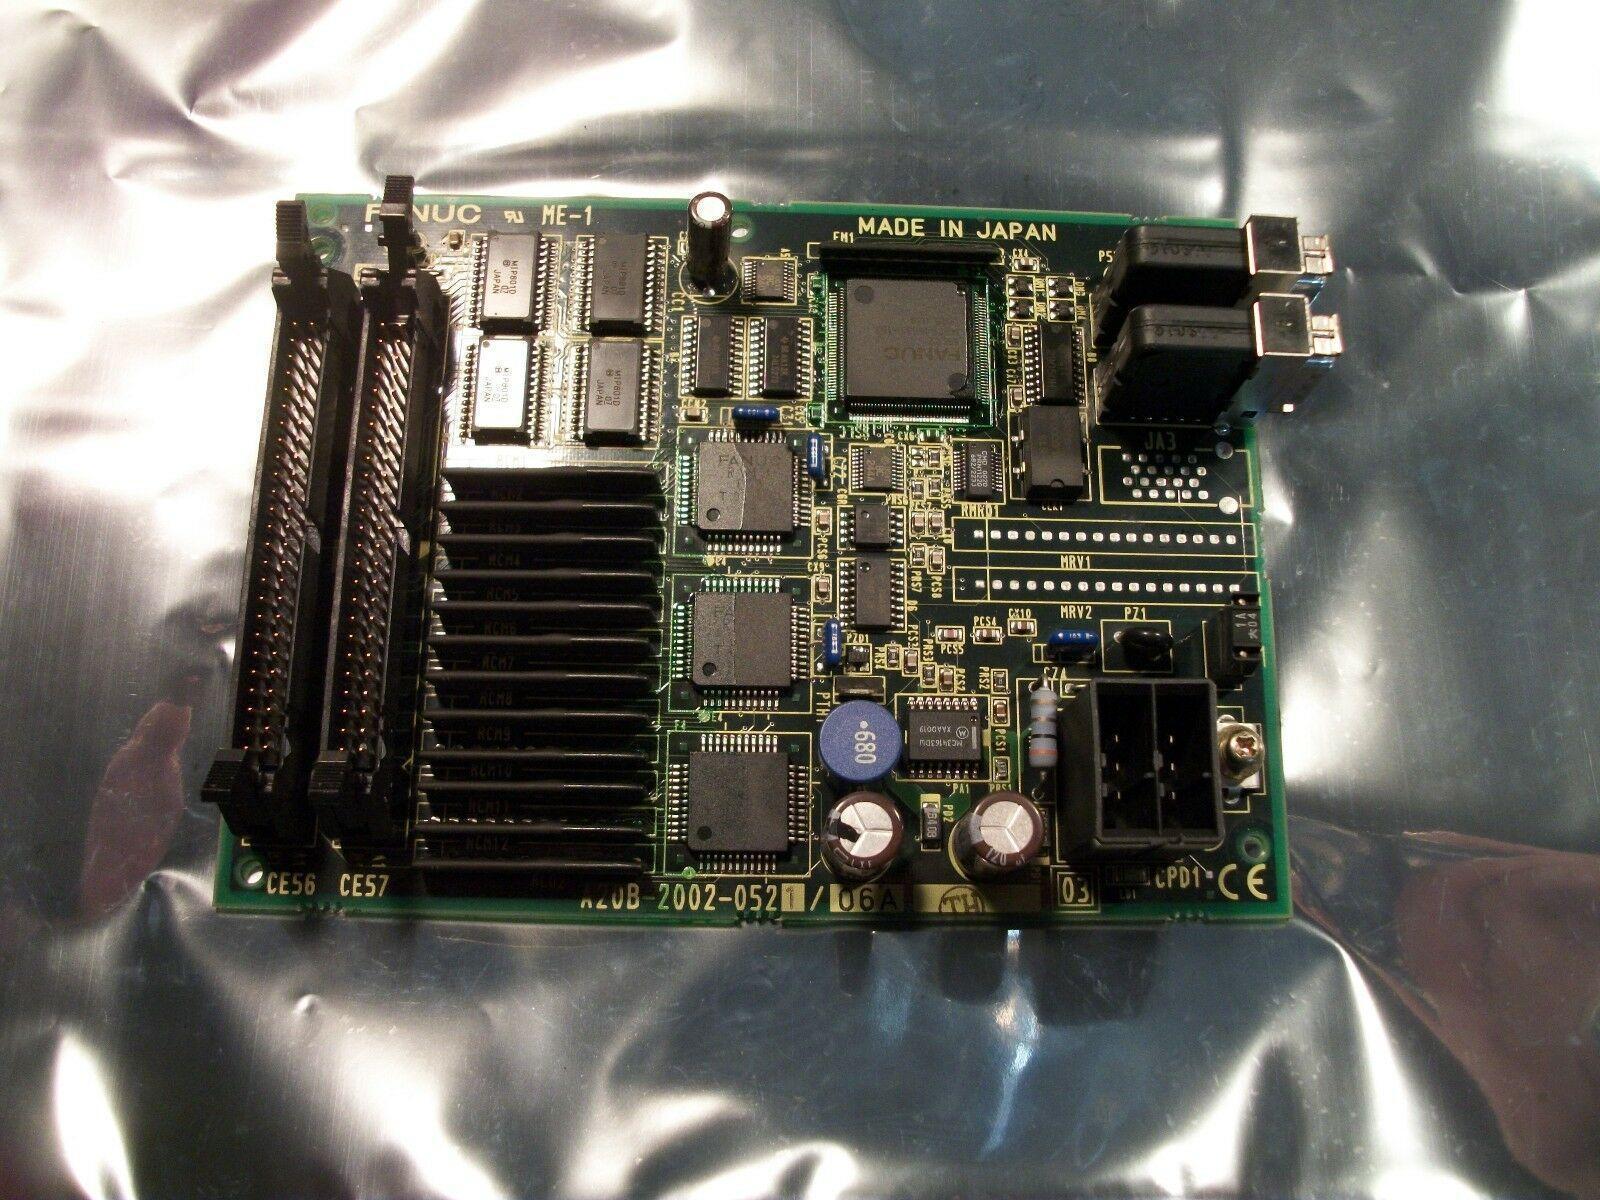 Fanuc I/O Interface Board A02B-2002-0521/06A